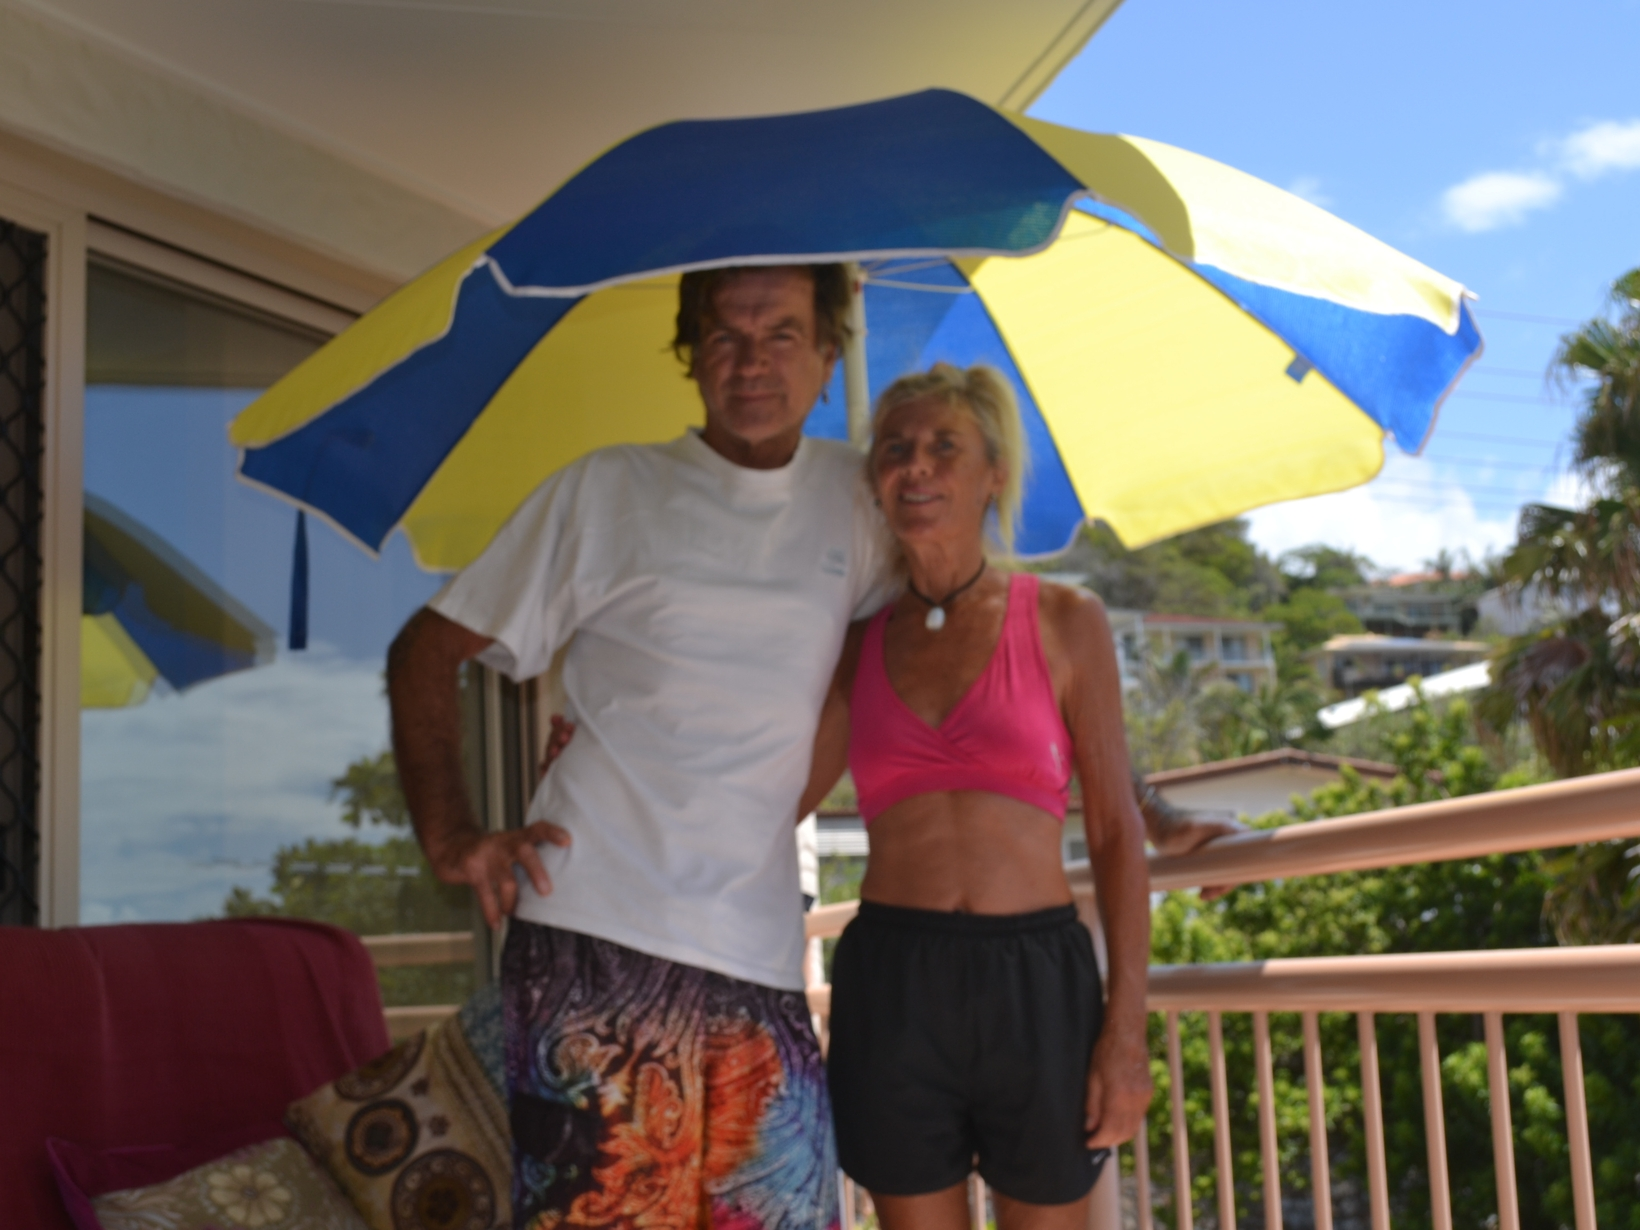 Gillian & Daniel from South West Rocks, New South Wales, Australia